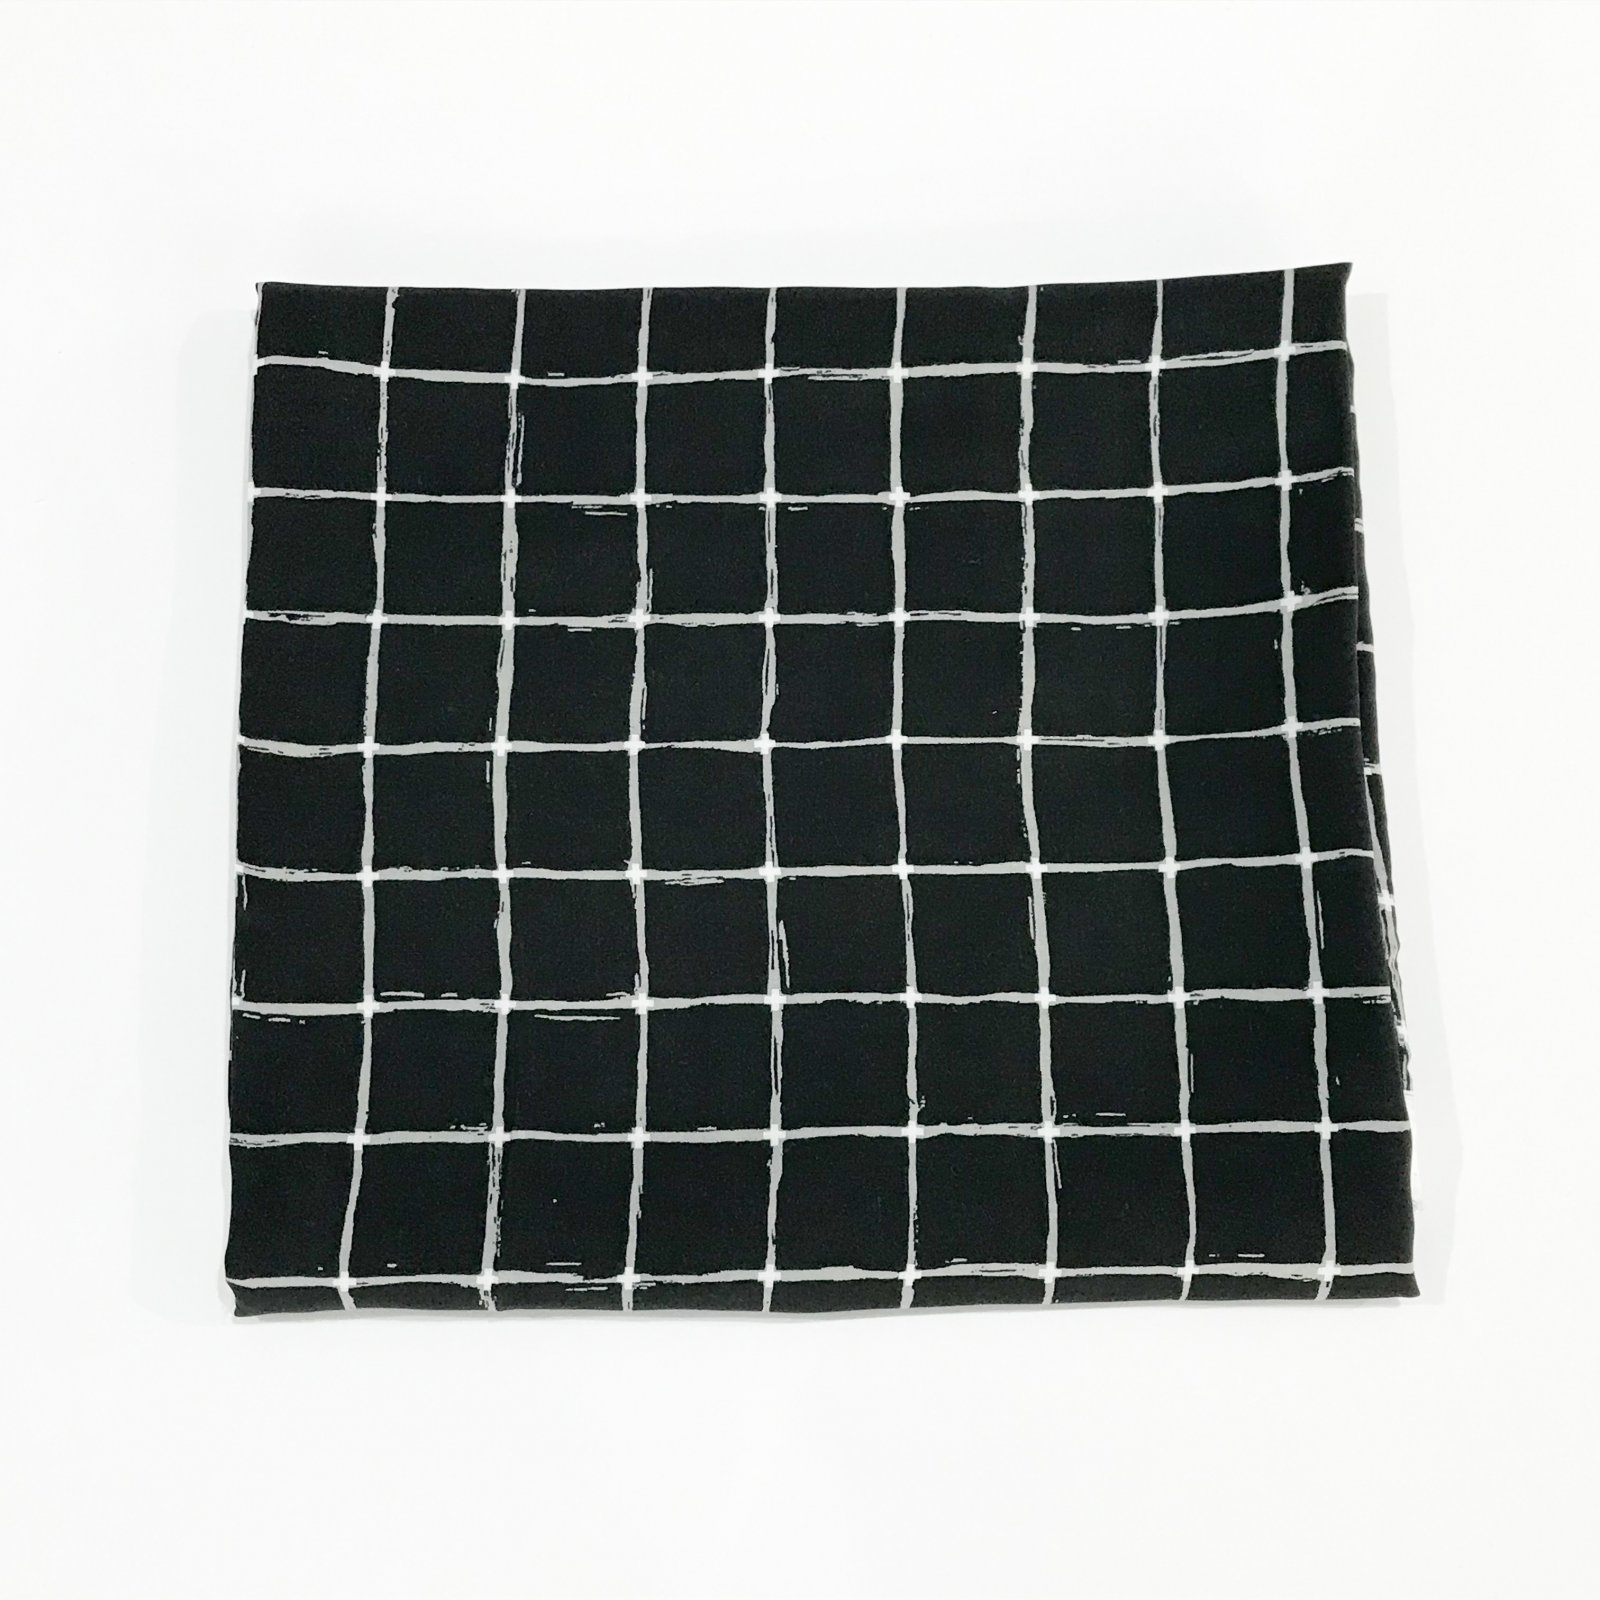 1 yard + 23 inches - Rayon Challis - AGF - Grid Negative